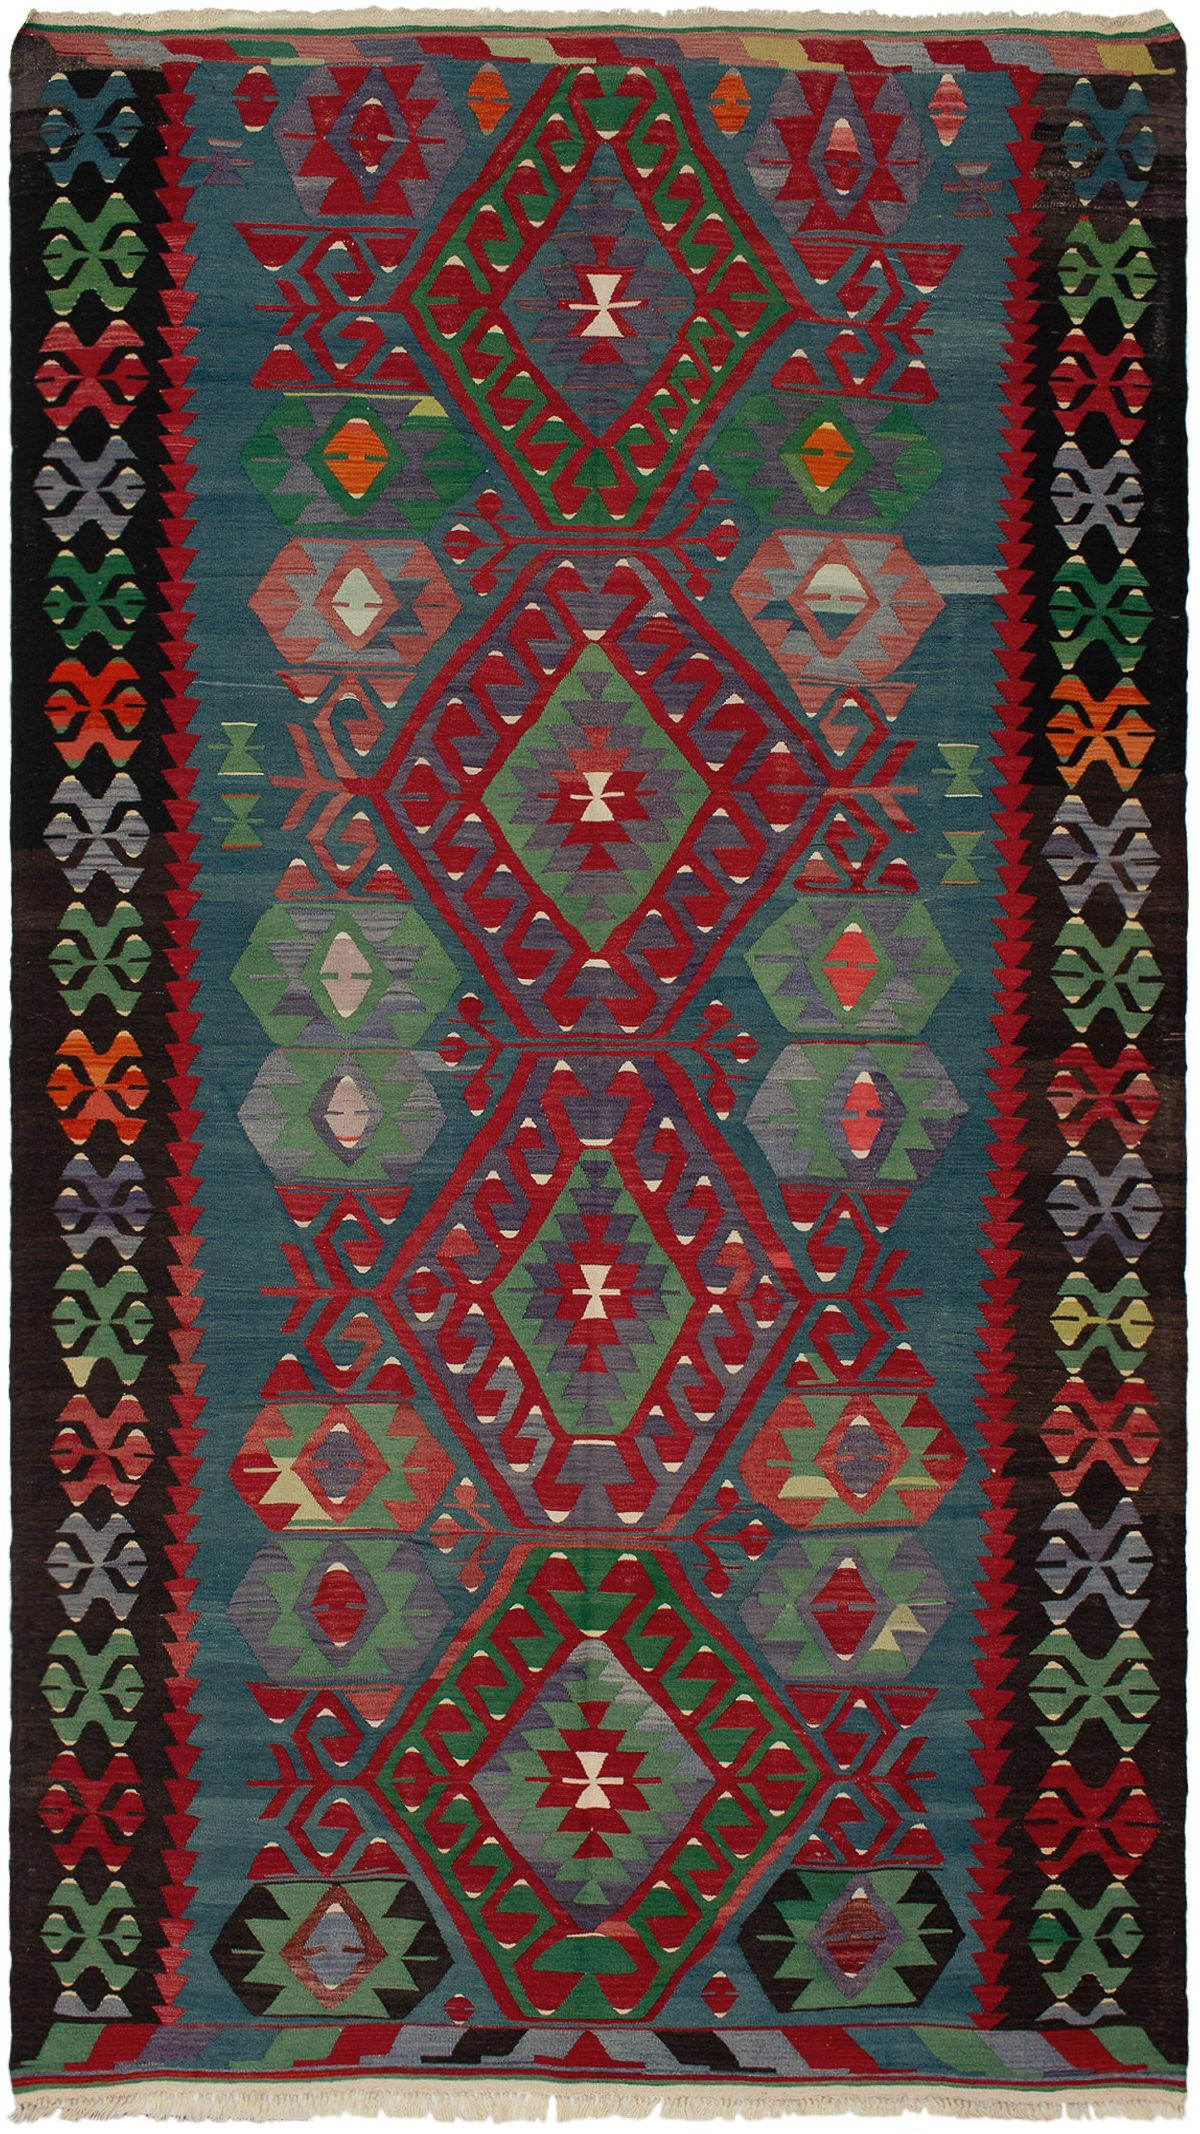 "Hand woven Sivas Red Wool Kilim 5'11"" x 11'0"" Size: 5'11"" x 11'0"""